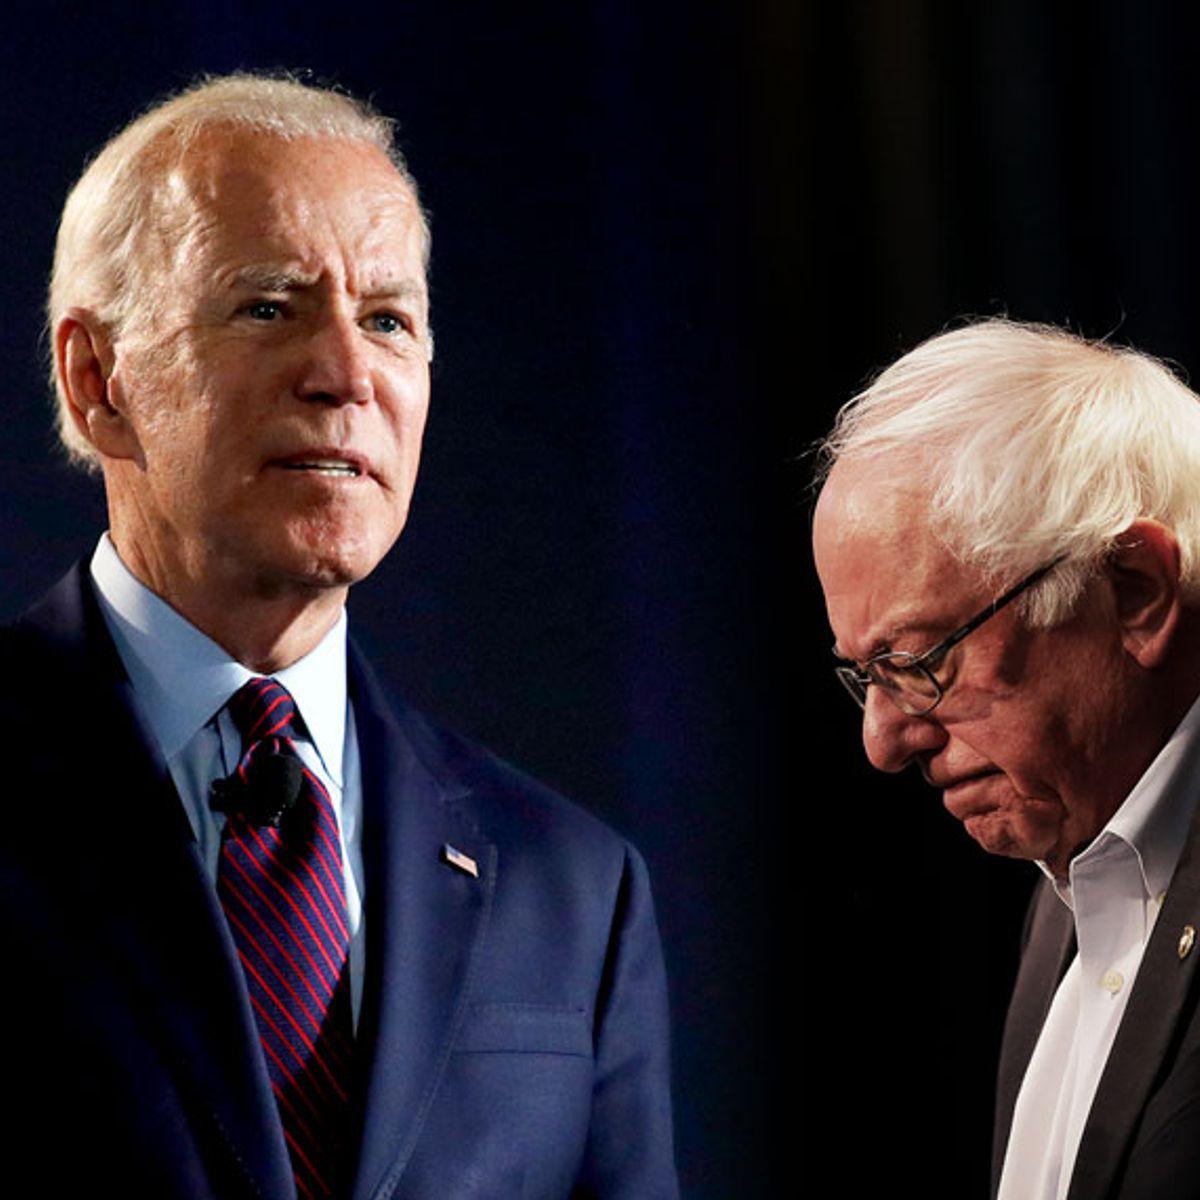 Media headlines obscure Joe Biden's false statements on cutting Social Security